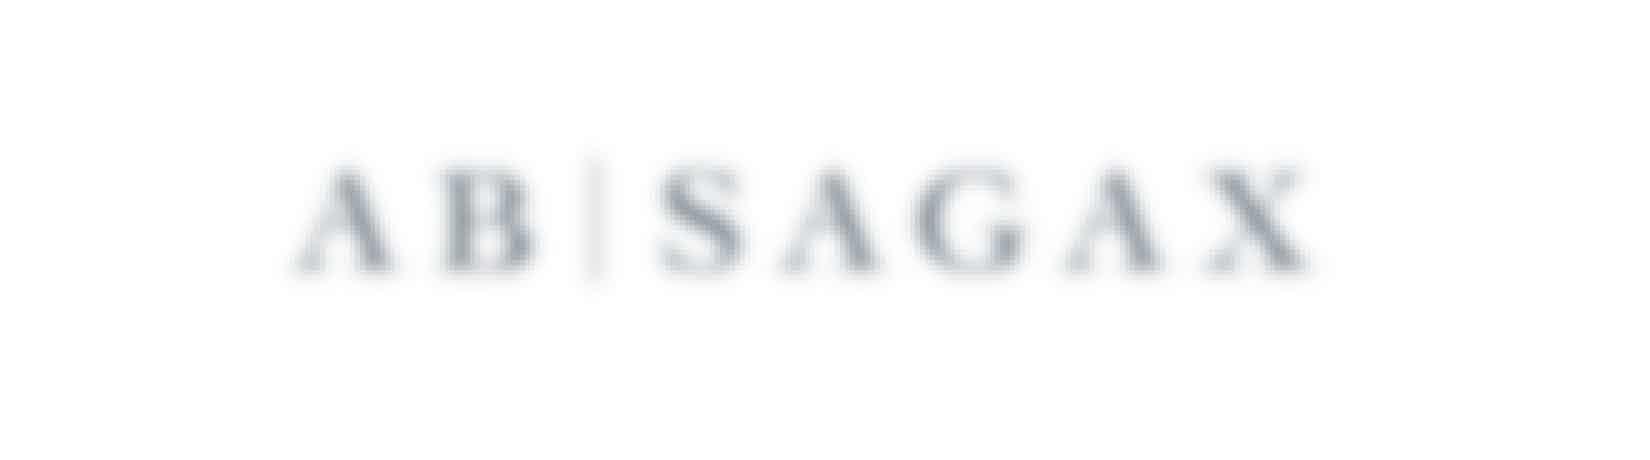 AB Sagax